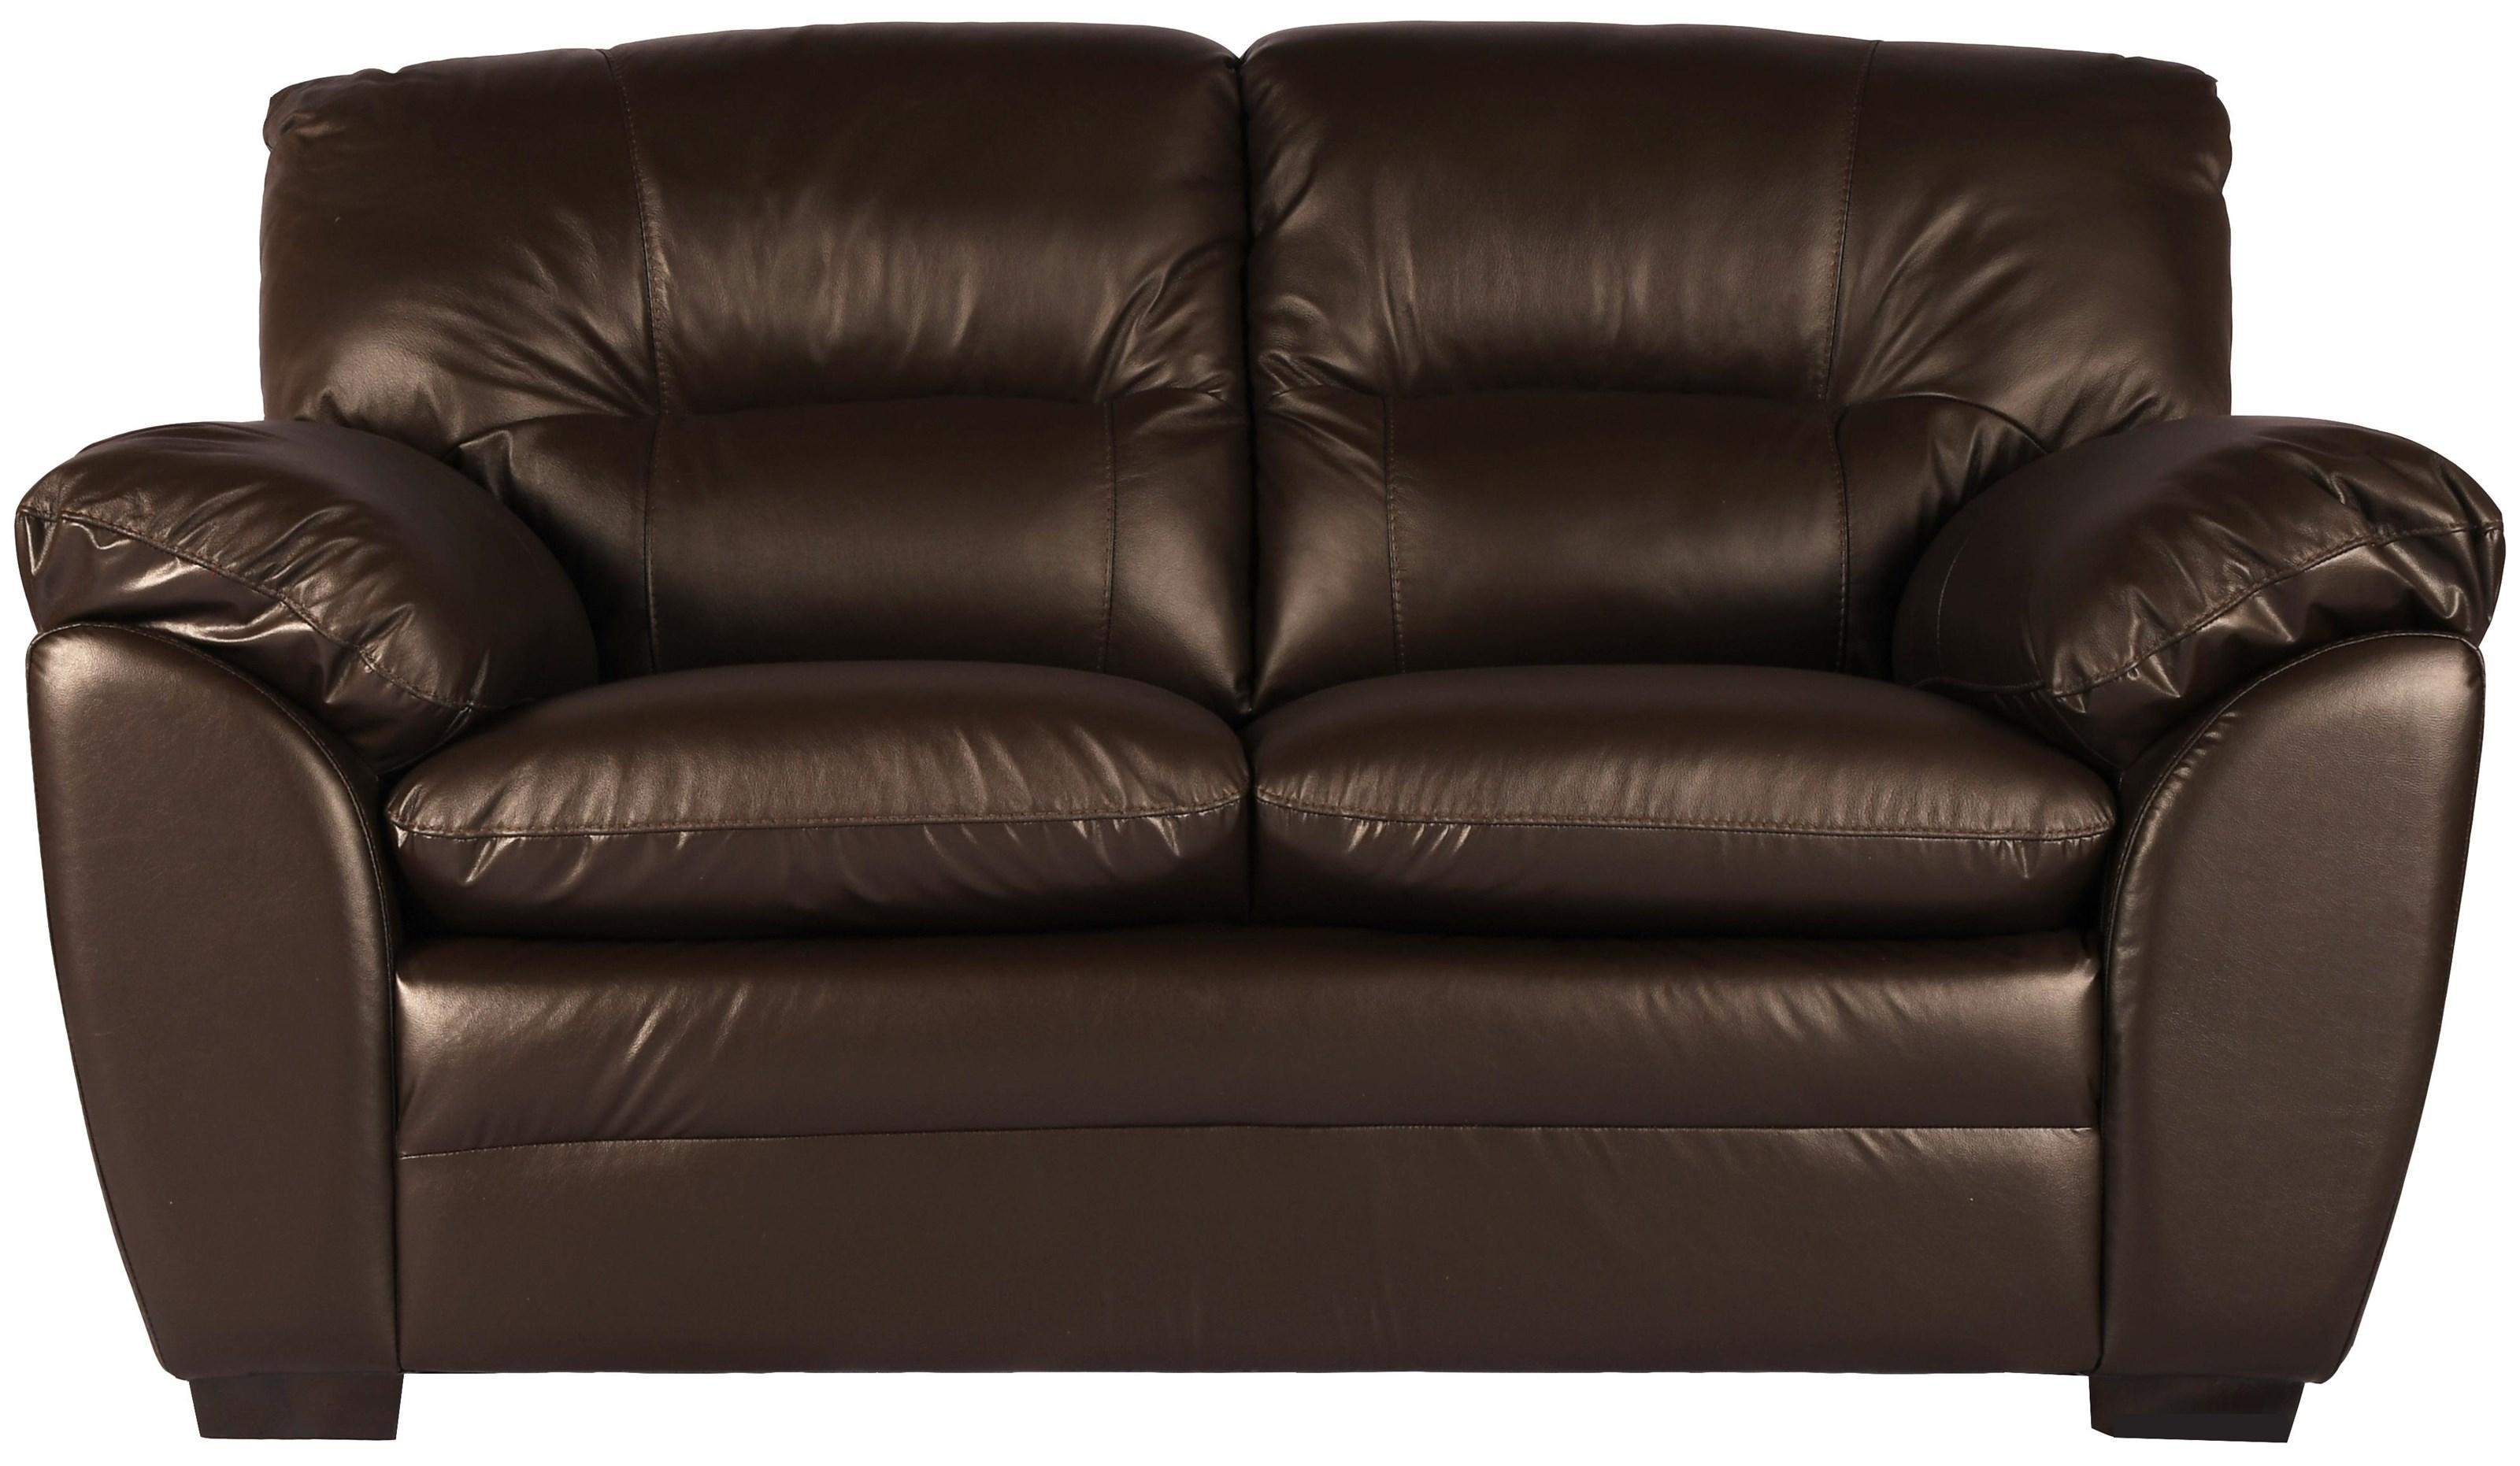 Buckhorn Love Seat by Rockwood at Bennett's Furniture and Mattresses